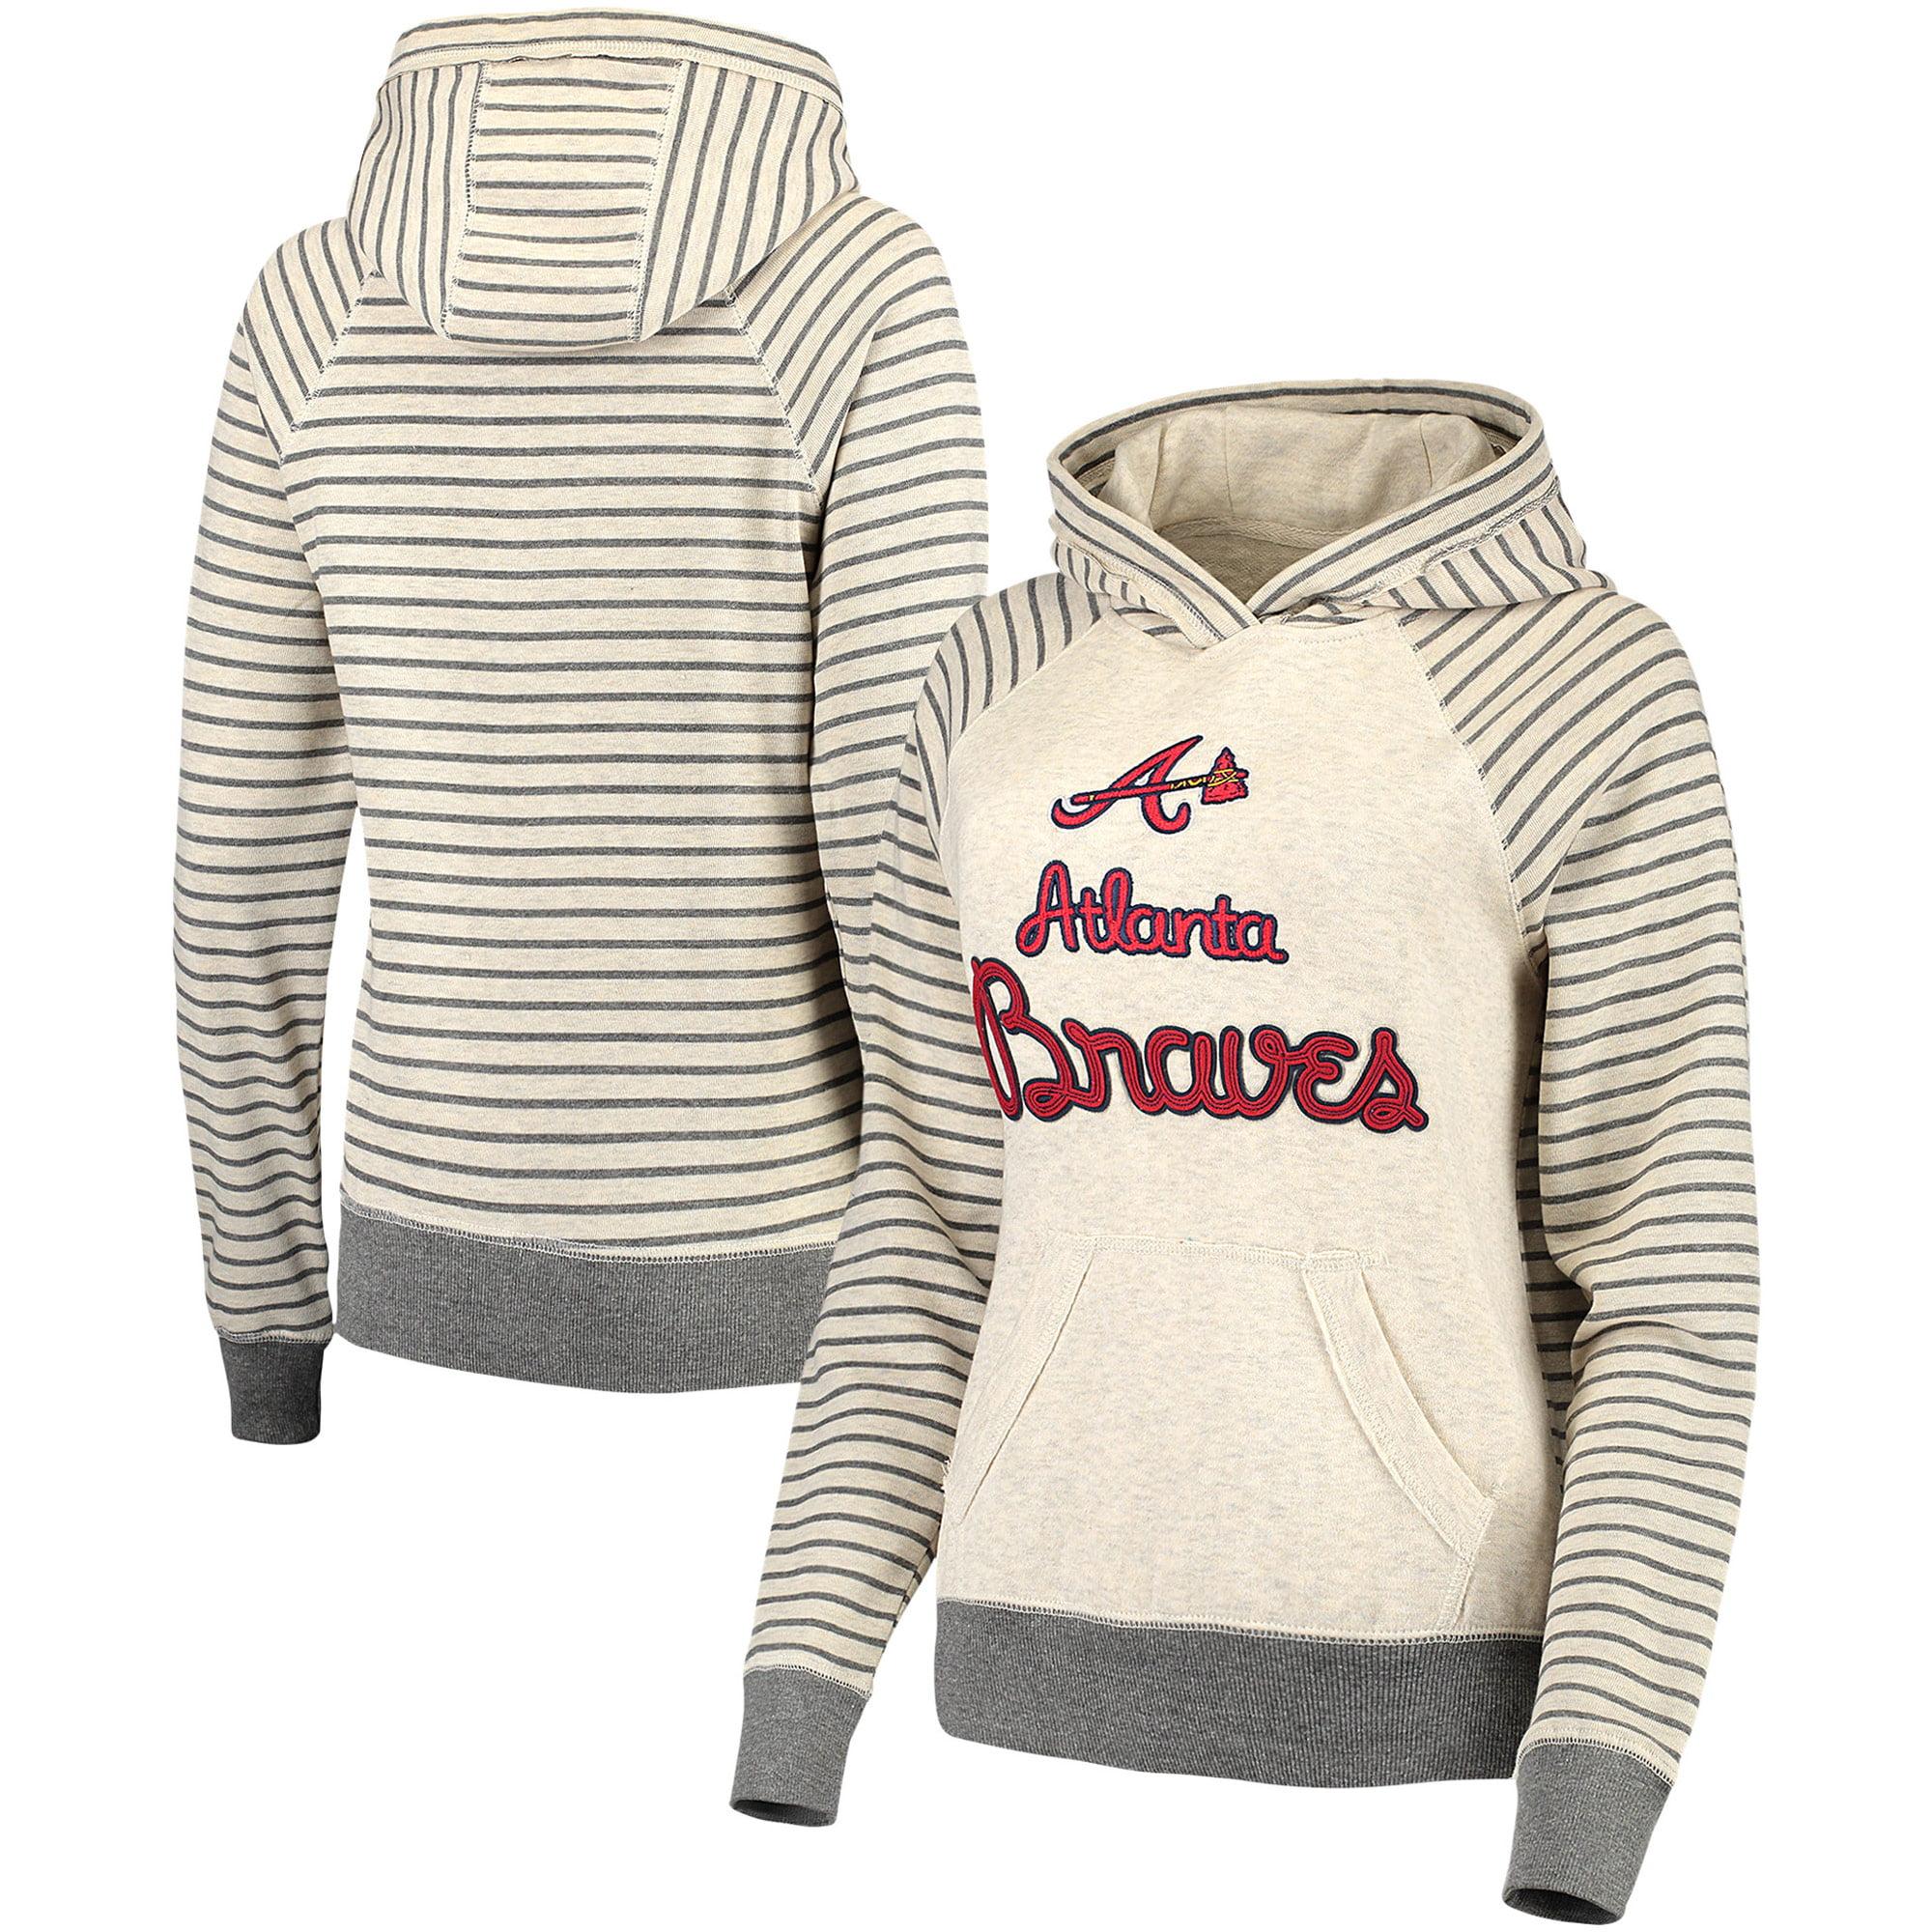 Atlanta Braves Soft as a Grape Women's Bio Washed Stripe Sleeve Pullover Hoodie - Cream/Gray